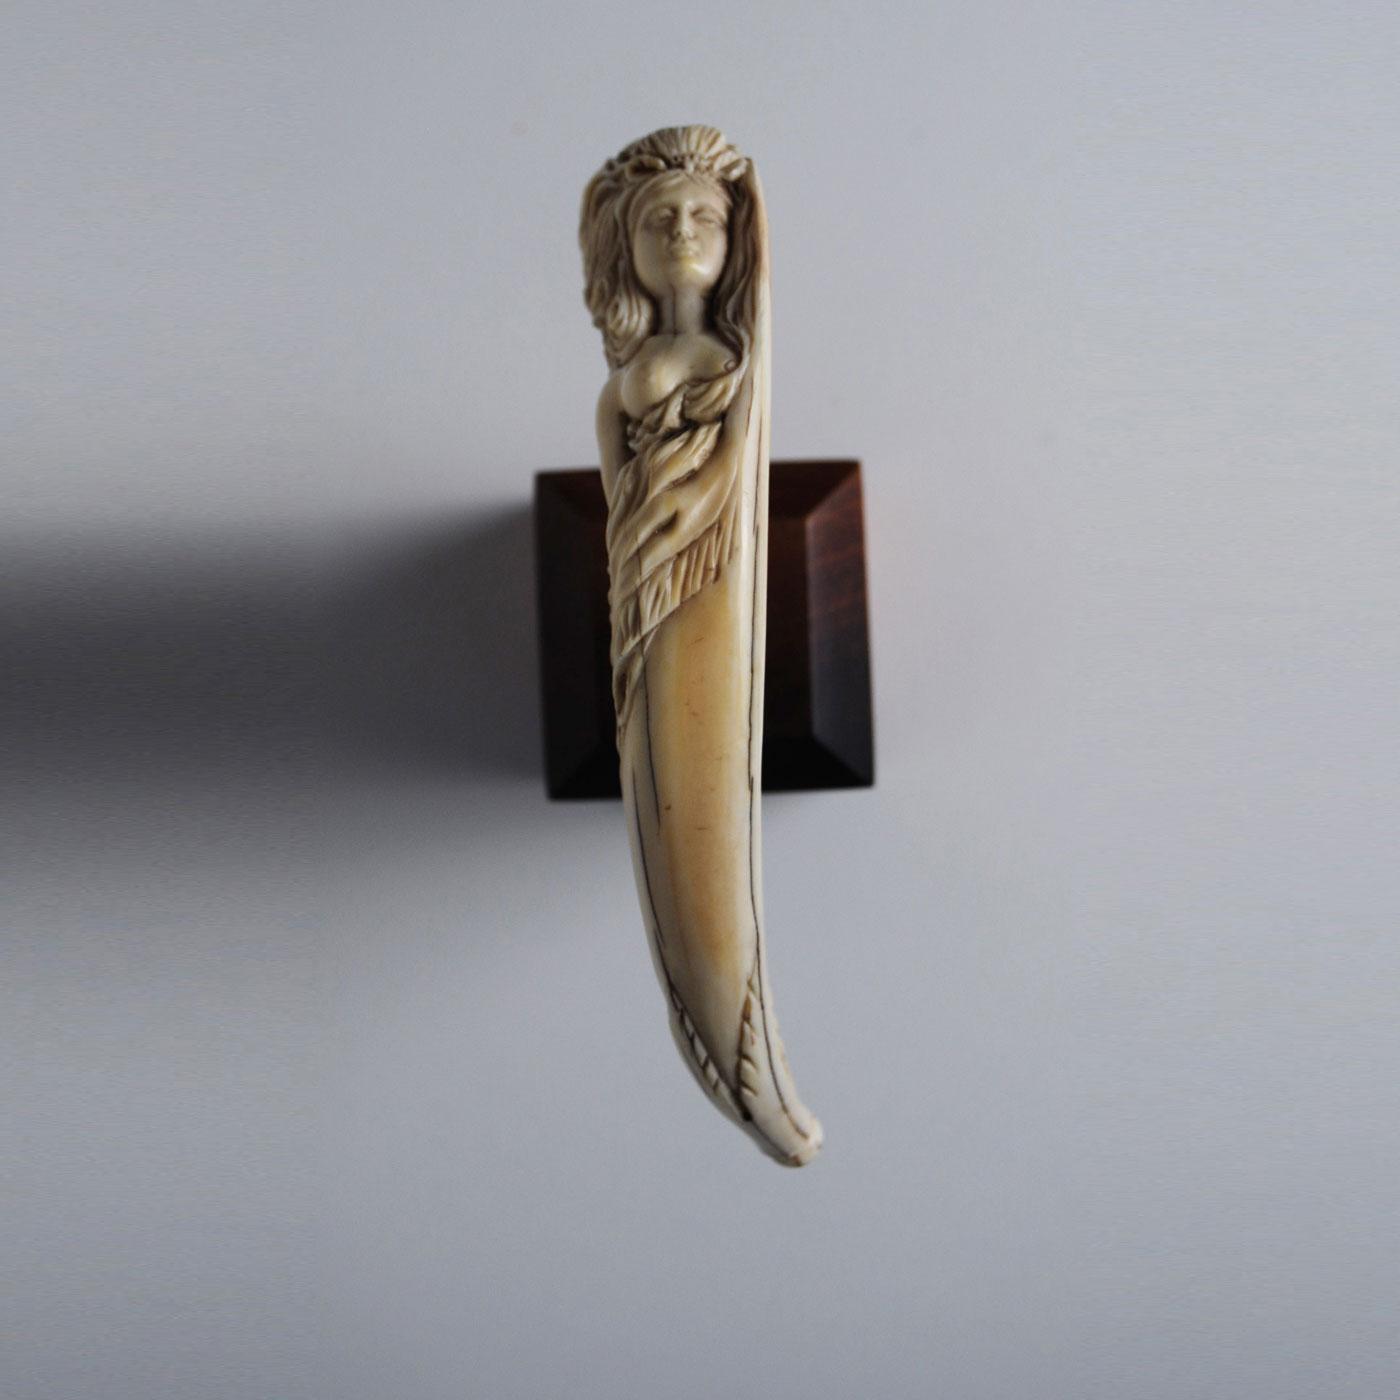 Whale bone carved into the mast head of a ship jeffrey